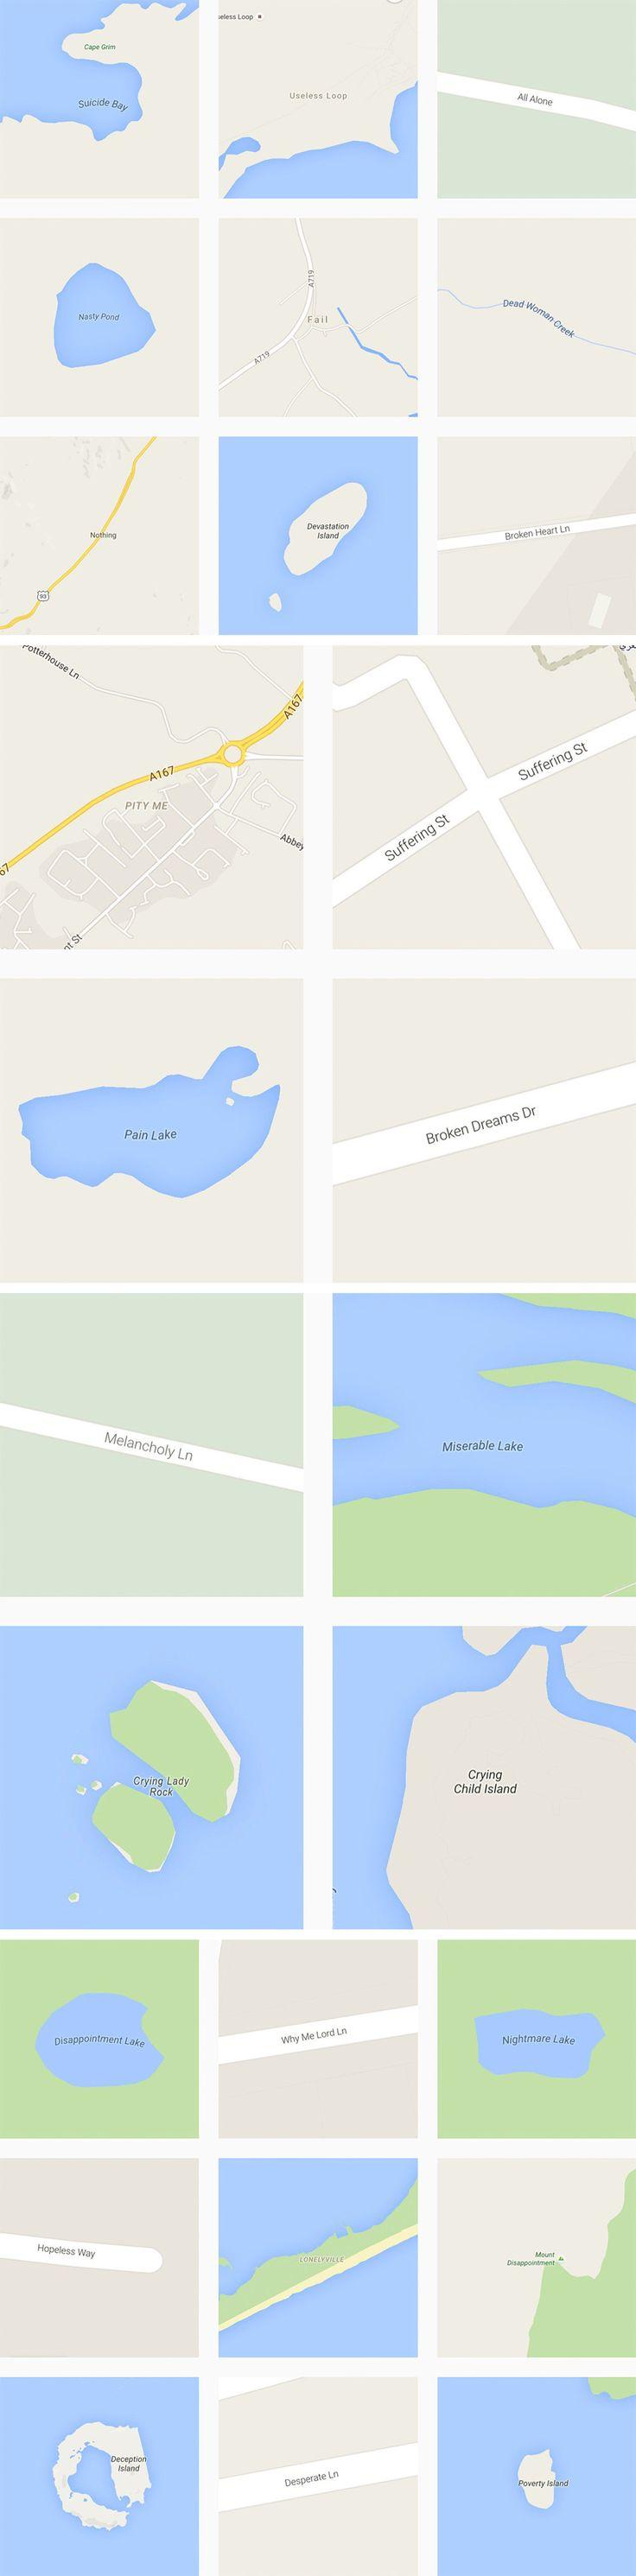 Archiving the World's Saddest Destinations Via Google Maps